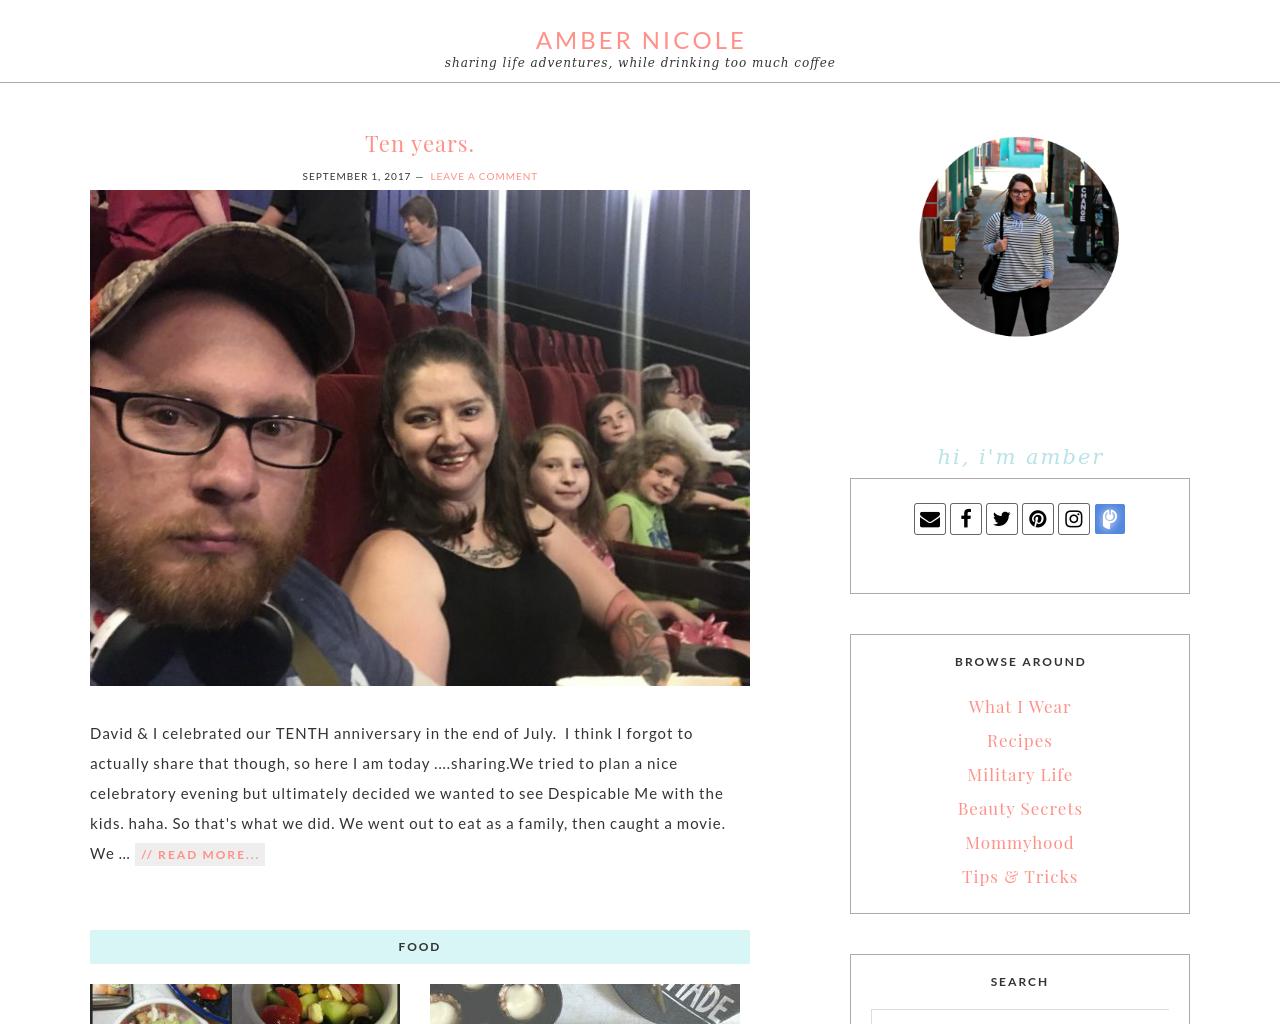 Amber-Nicole-Blog-Advertising-Reviews-Pricing